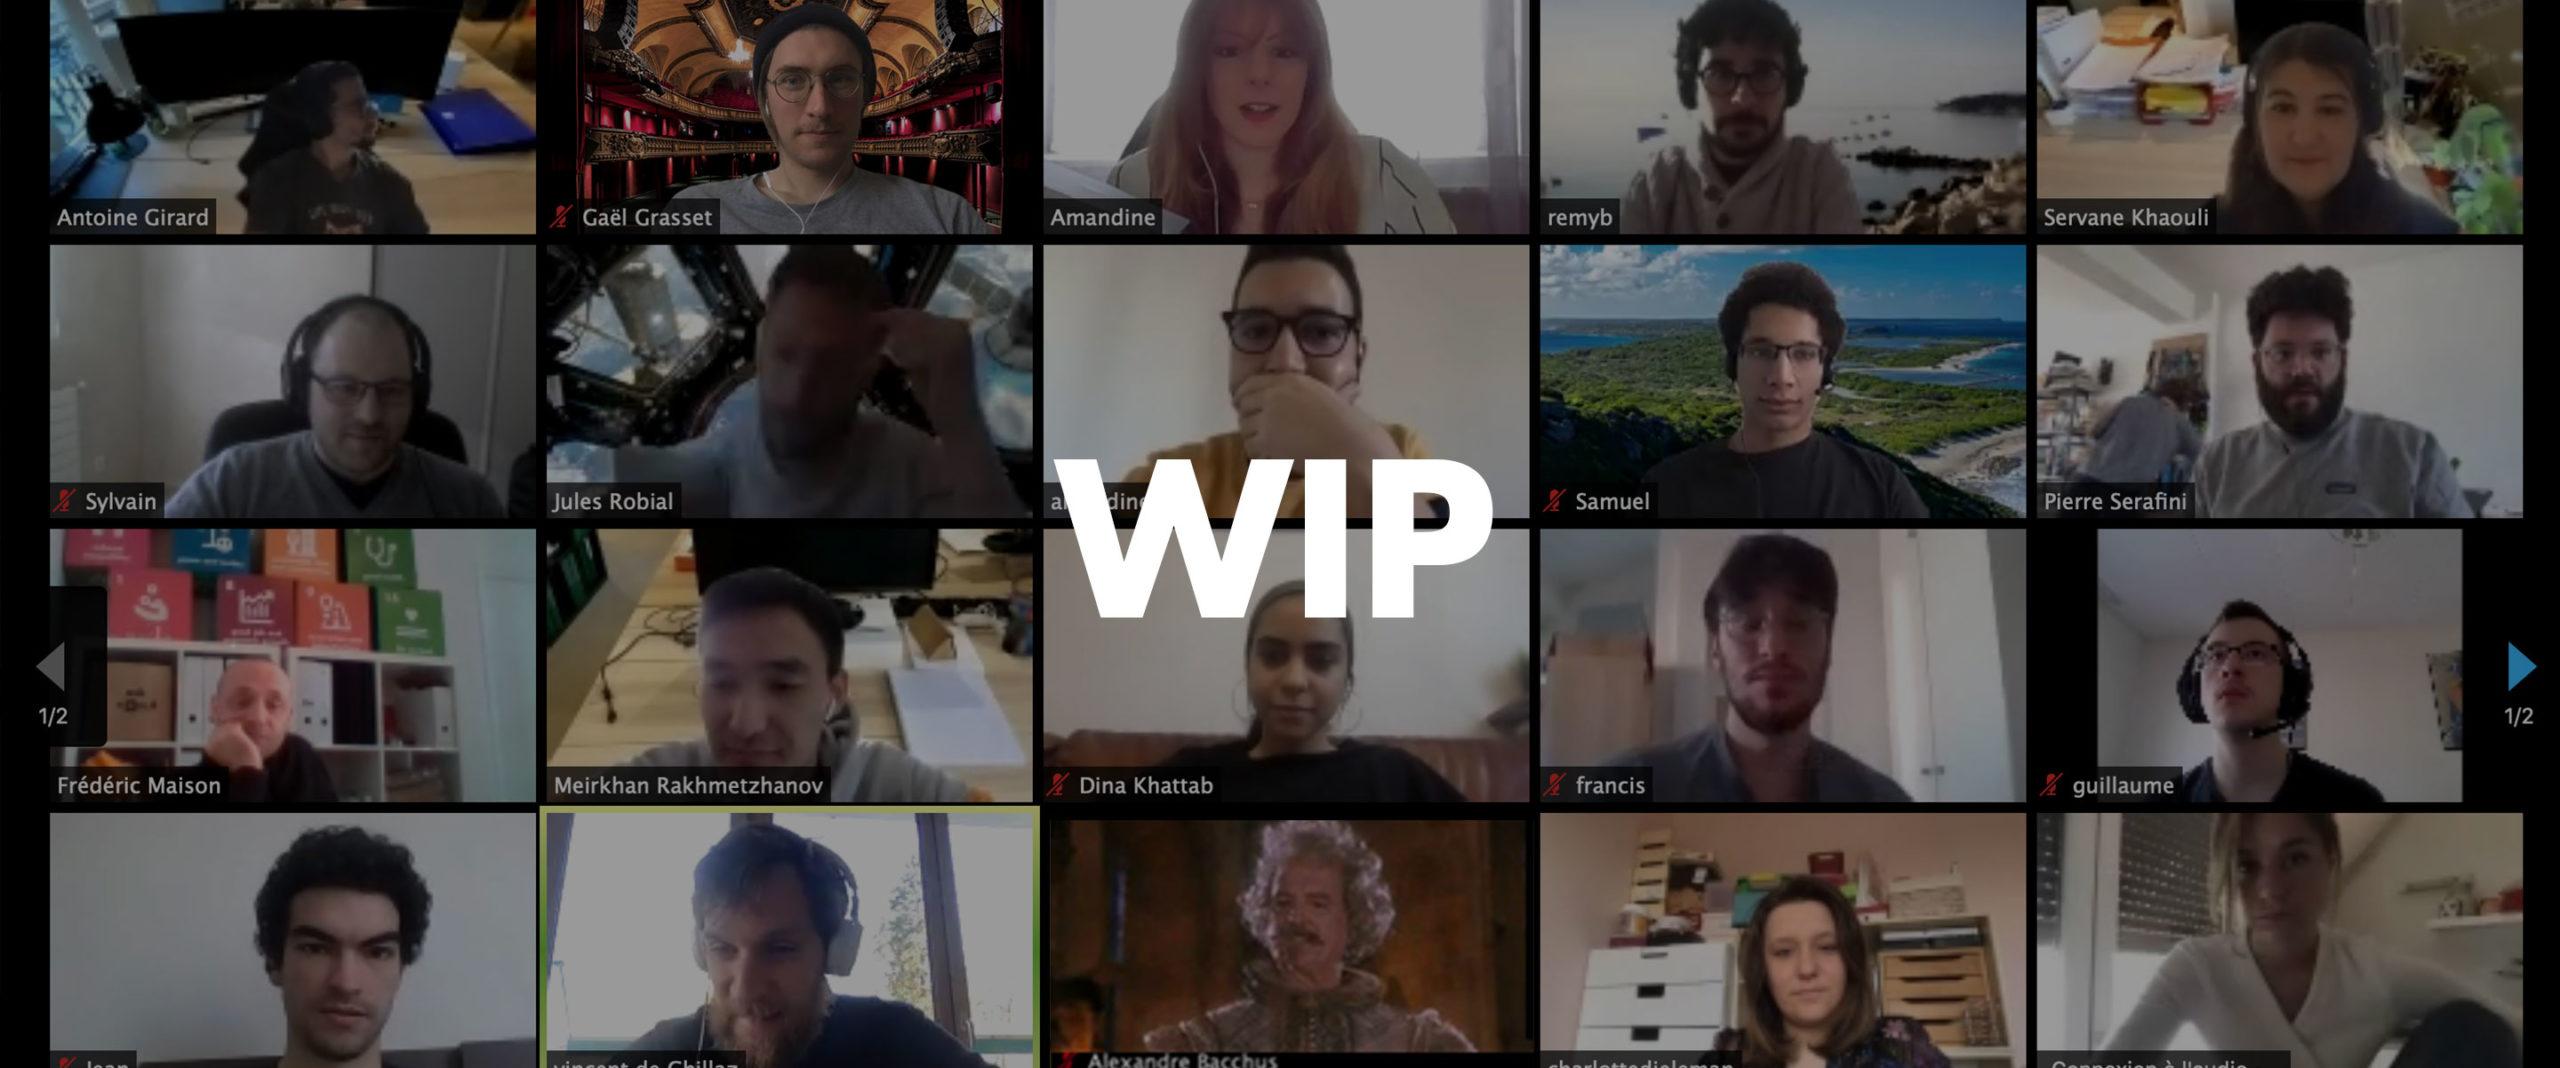 startup confinement namR equipe